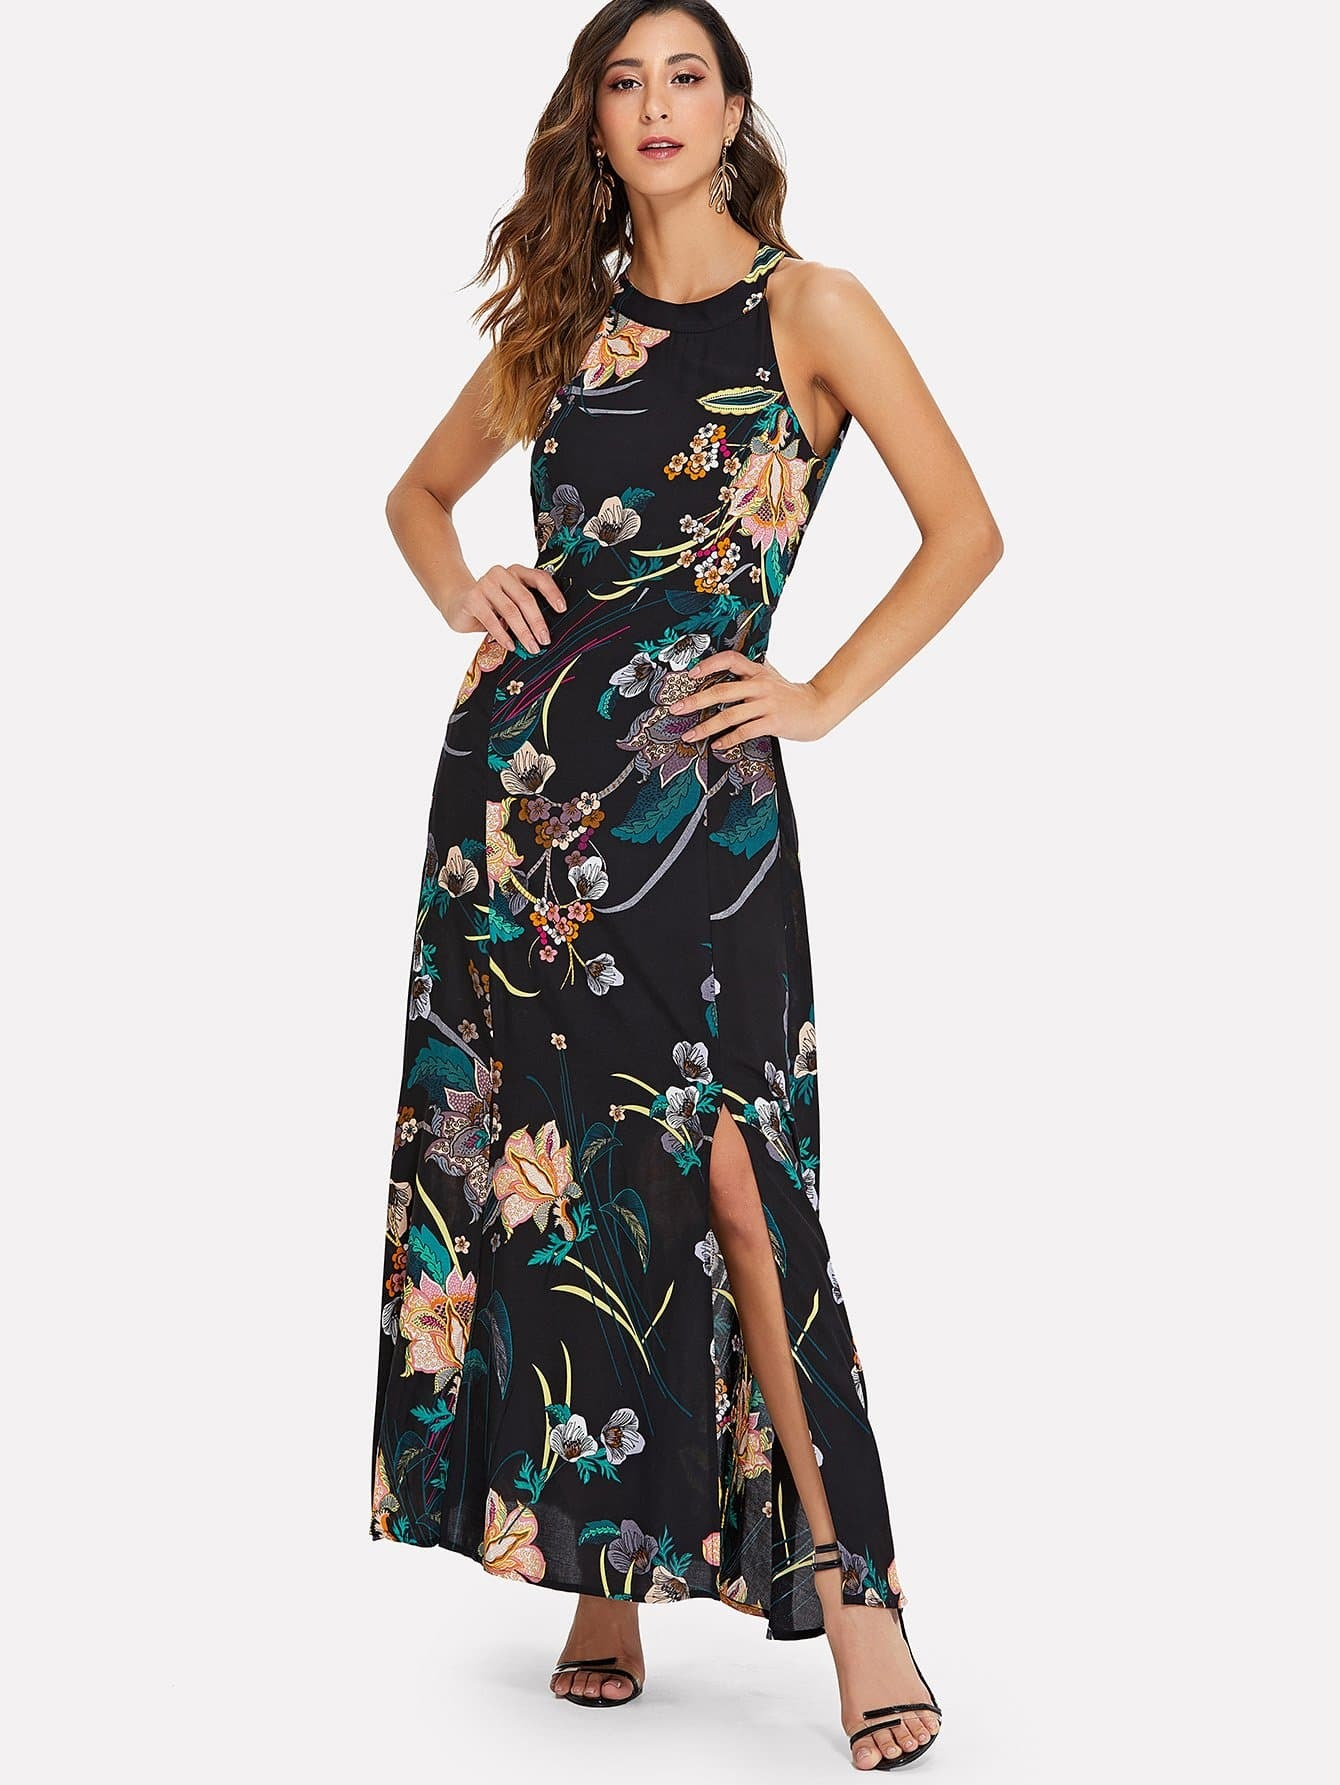 Botanical Print Halter Dress scalloped edge botanical print dress